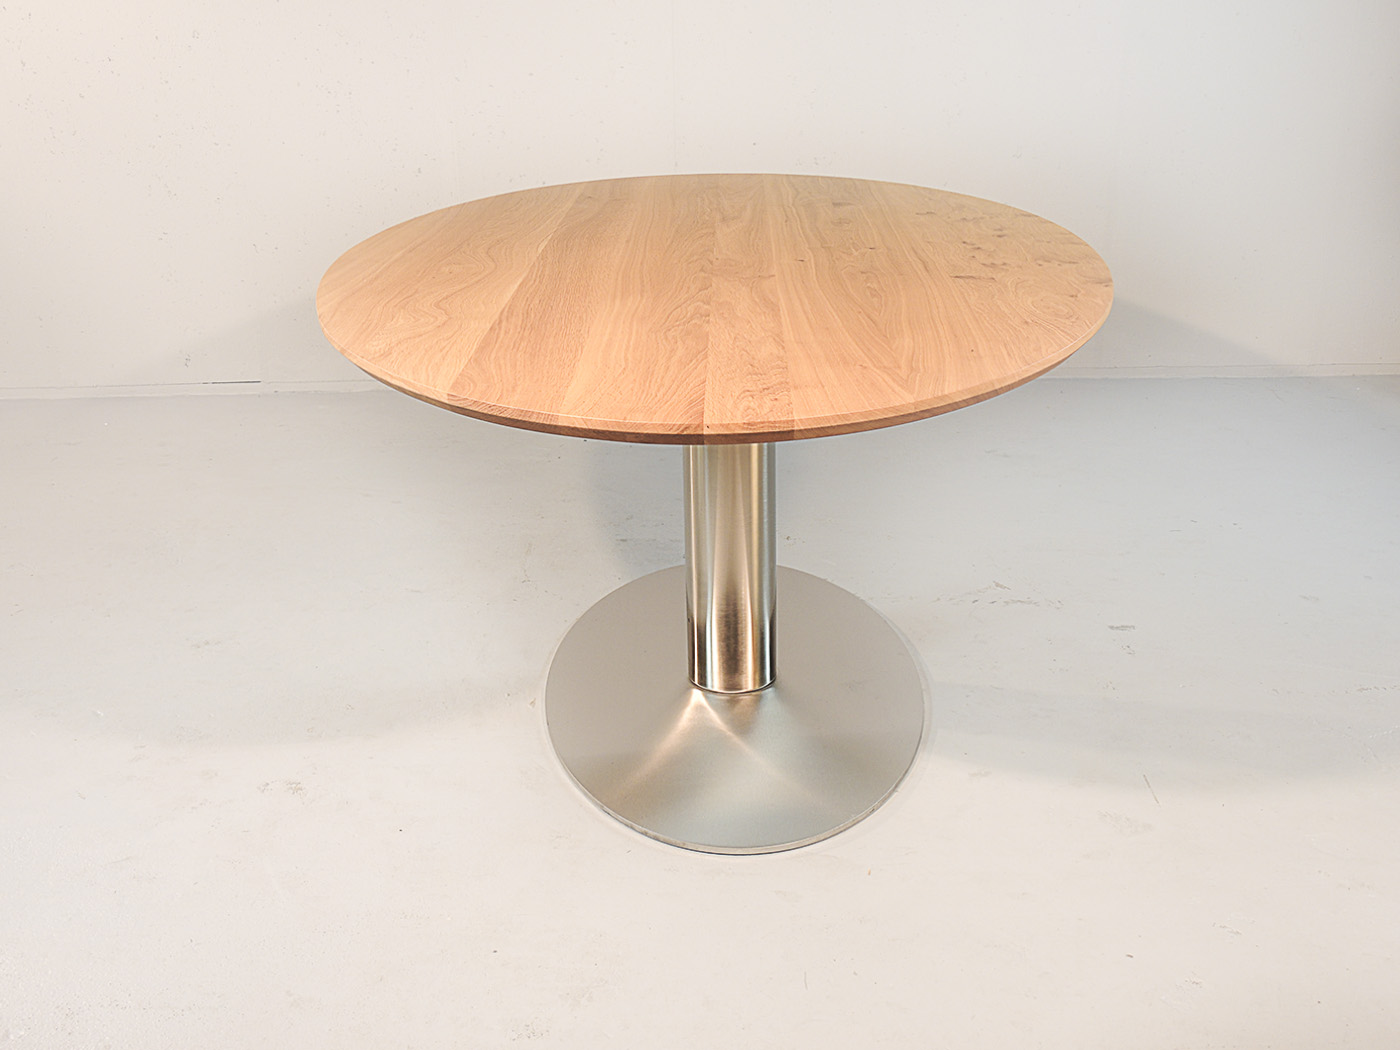 Bologna - Ovale tafel met RVS onderstel